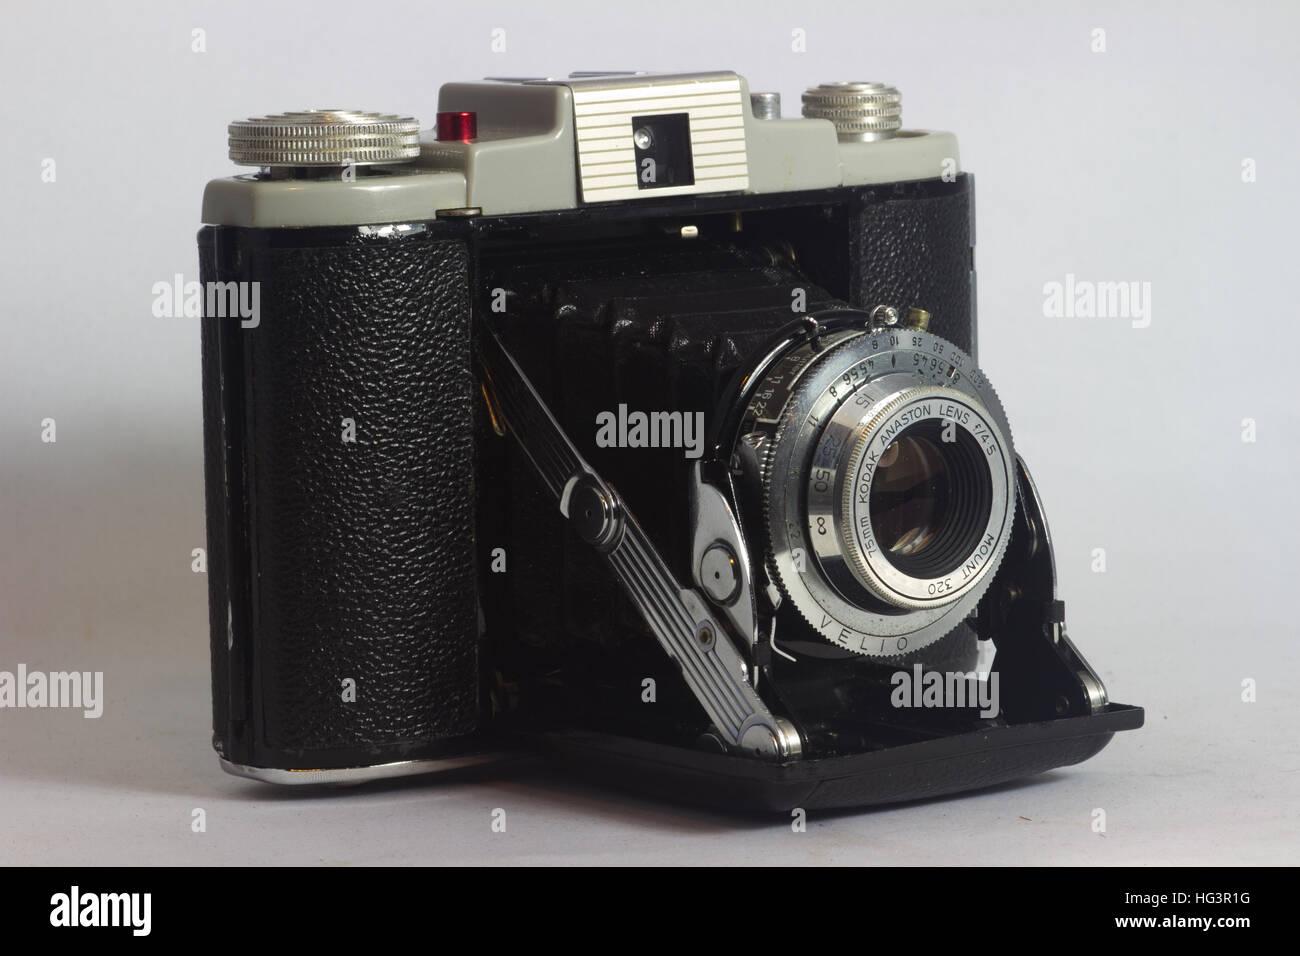 Vintage folding bellows film camera - Stock Image